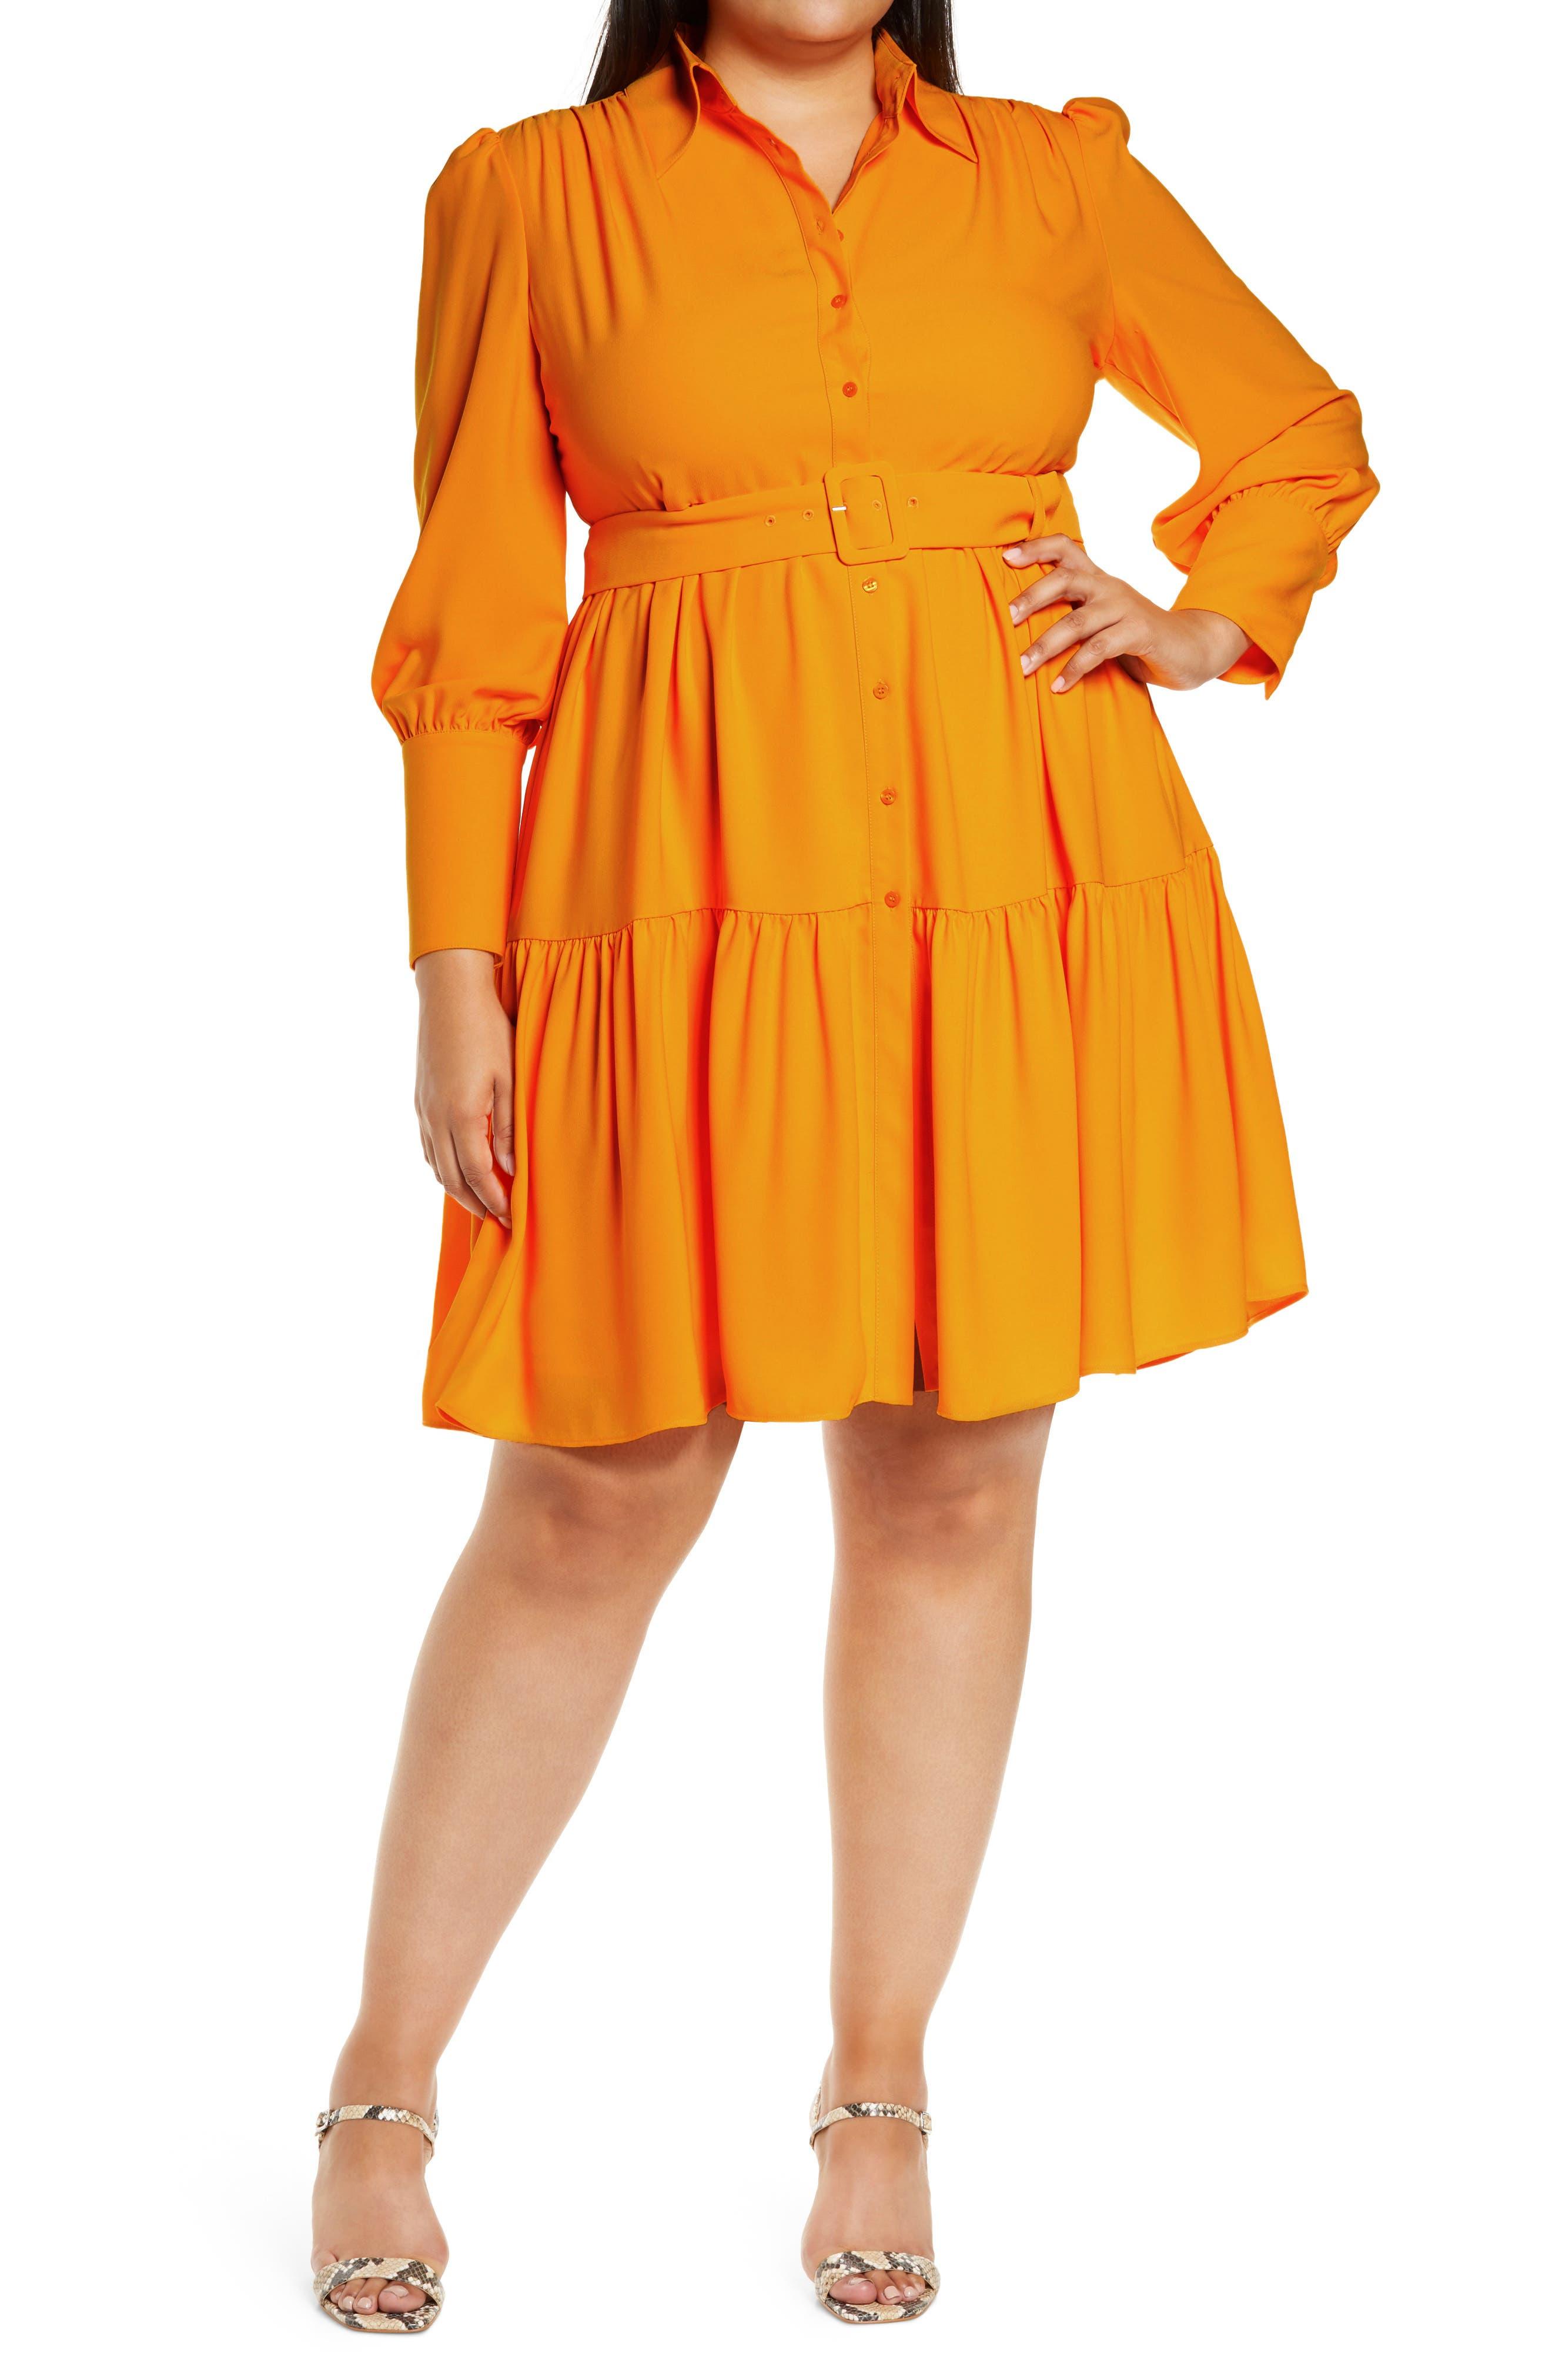 60s 70s Plus Size Dresses, Clothing, Costumes Plus Size Womens Halogen X Atlantic-Pacific Belted Long Sleeve Shirtdress Size 26W - Orange $119.00 AT vintagedancer.com